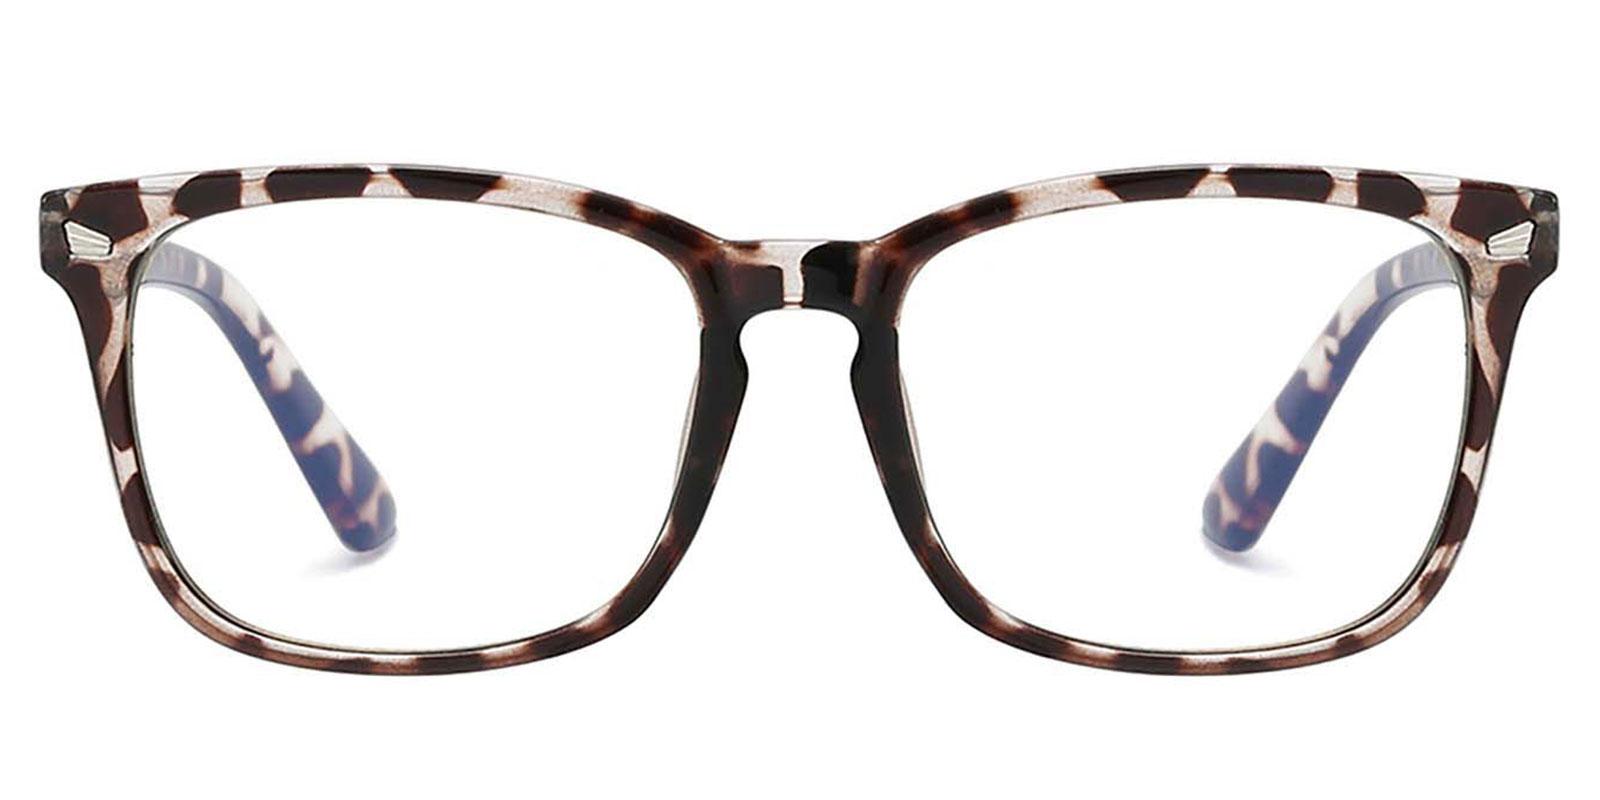 Amalia-Classic square super-light glasses